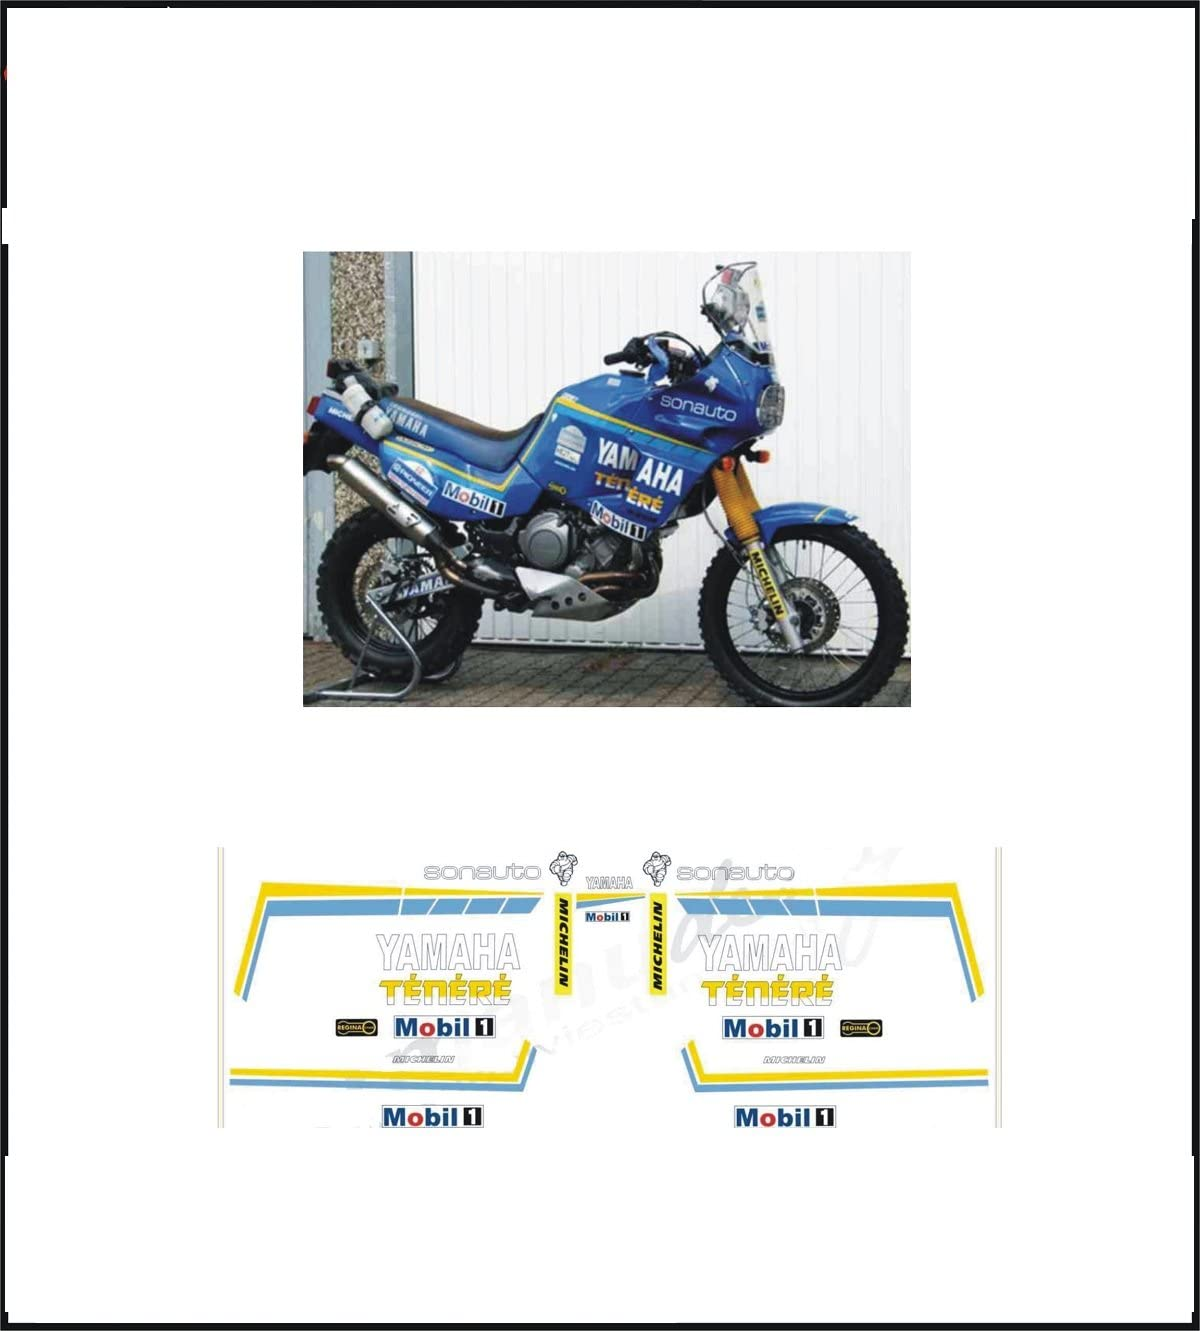 Kit Adesivi Decal Stikers Yamaha Xtz 750 Supertenere Replica Dakar Sonauto Ability To Customize The Colors Auto